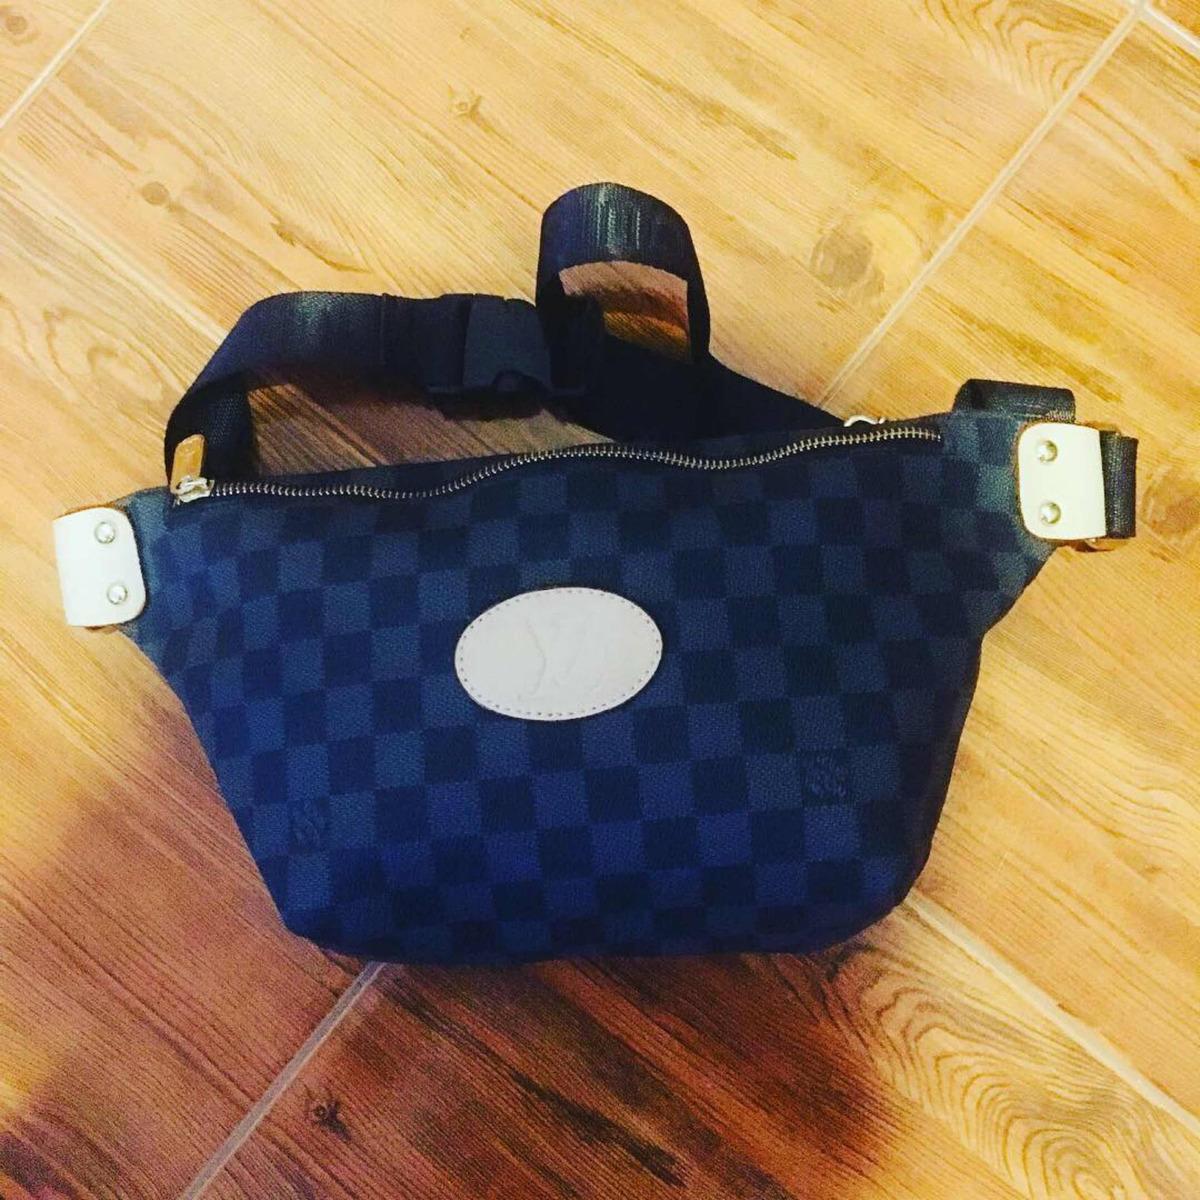 fc75f967d Riñonera Louis Vuitton Lv - $ 2.500,00 en Mercado Libre